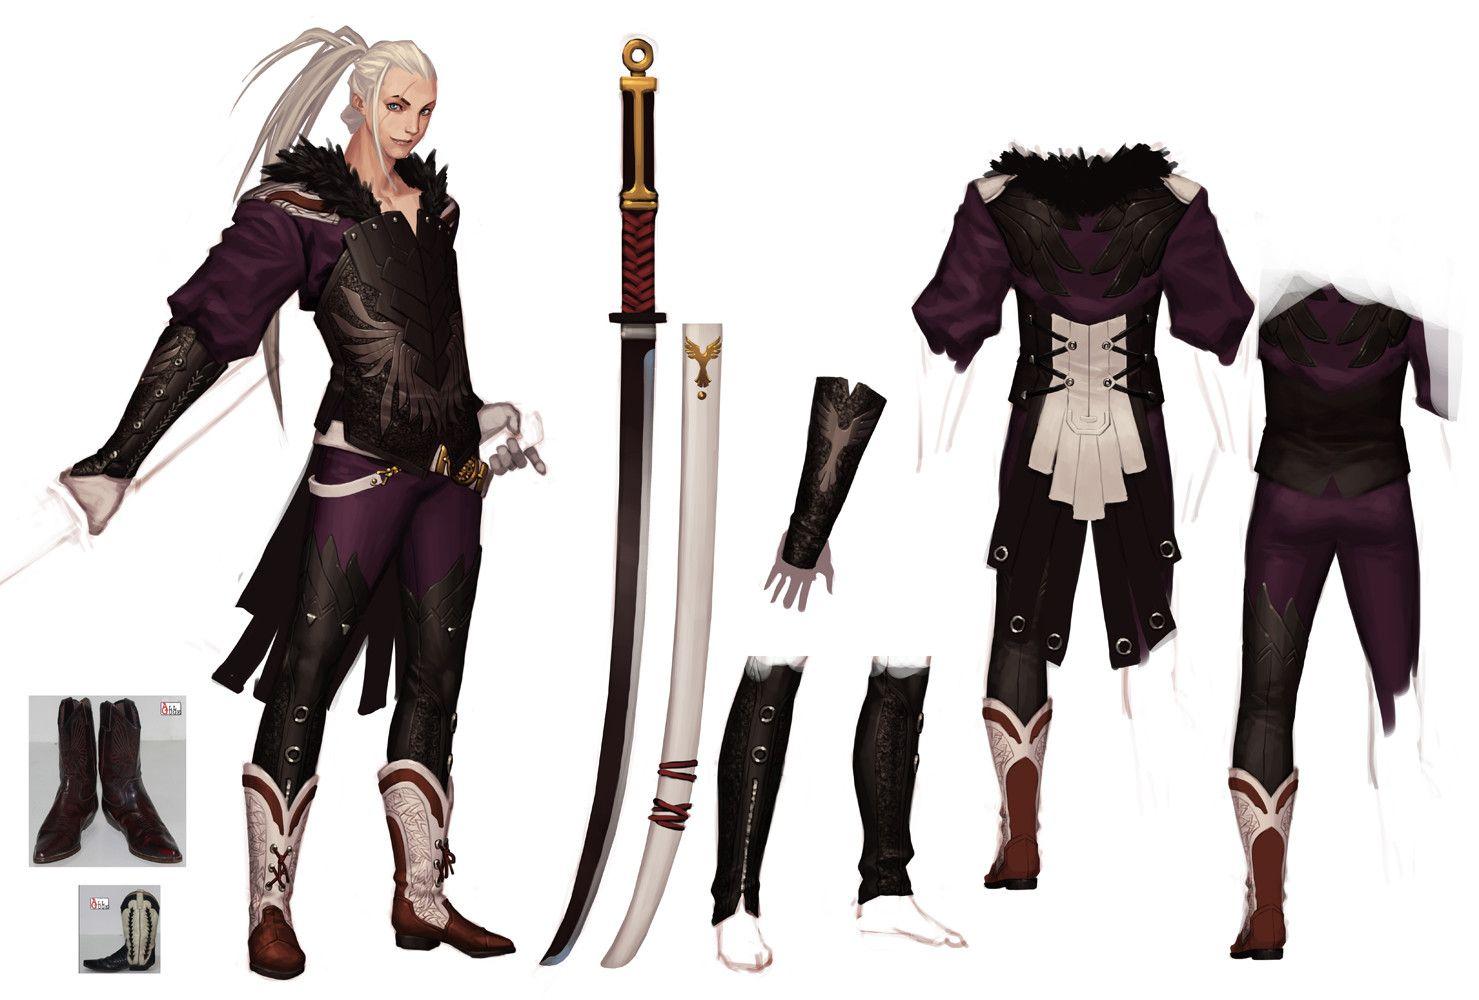 Cyphers Eagle 사이퍼즈 이글 2010 2011 Kang Joo Sung Galgoo Character Design Male Character Modeling Scifi Fantasy Art